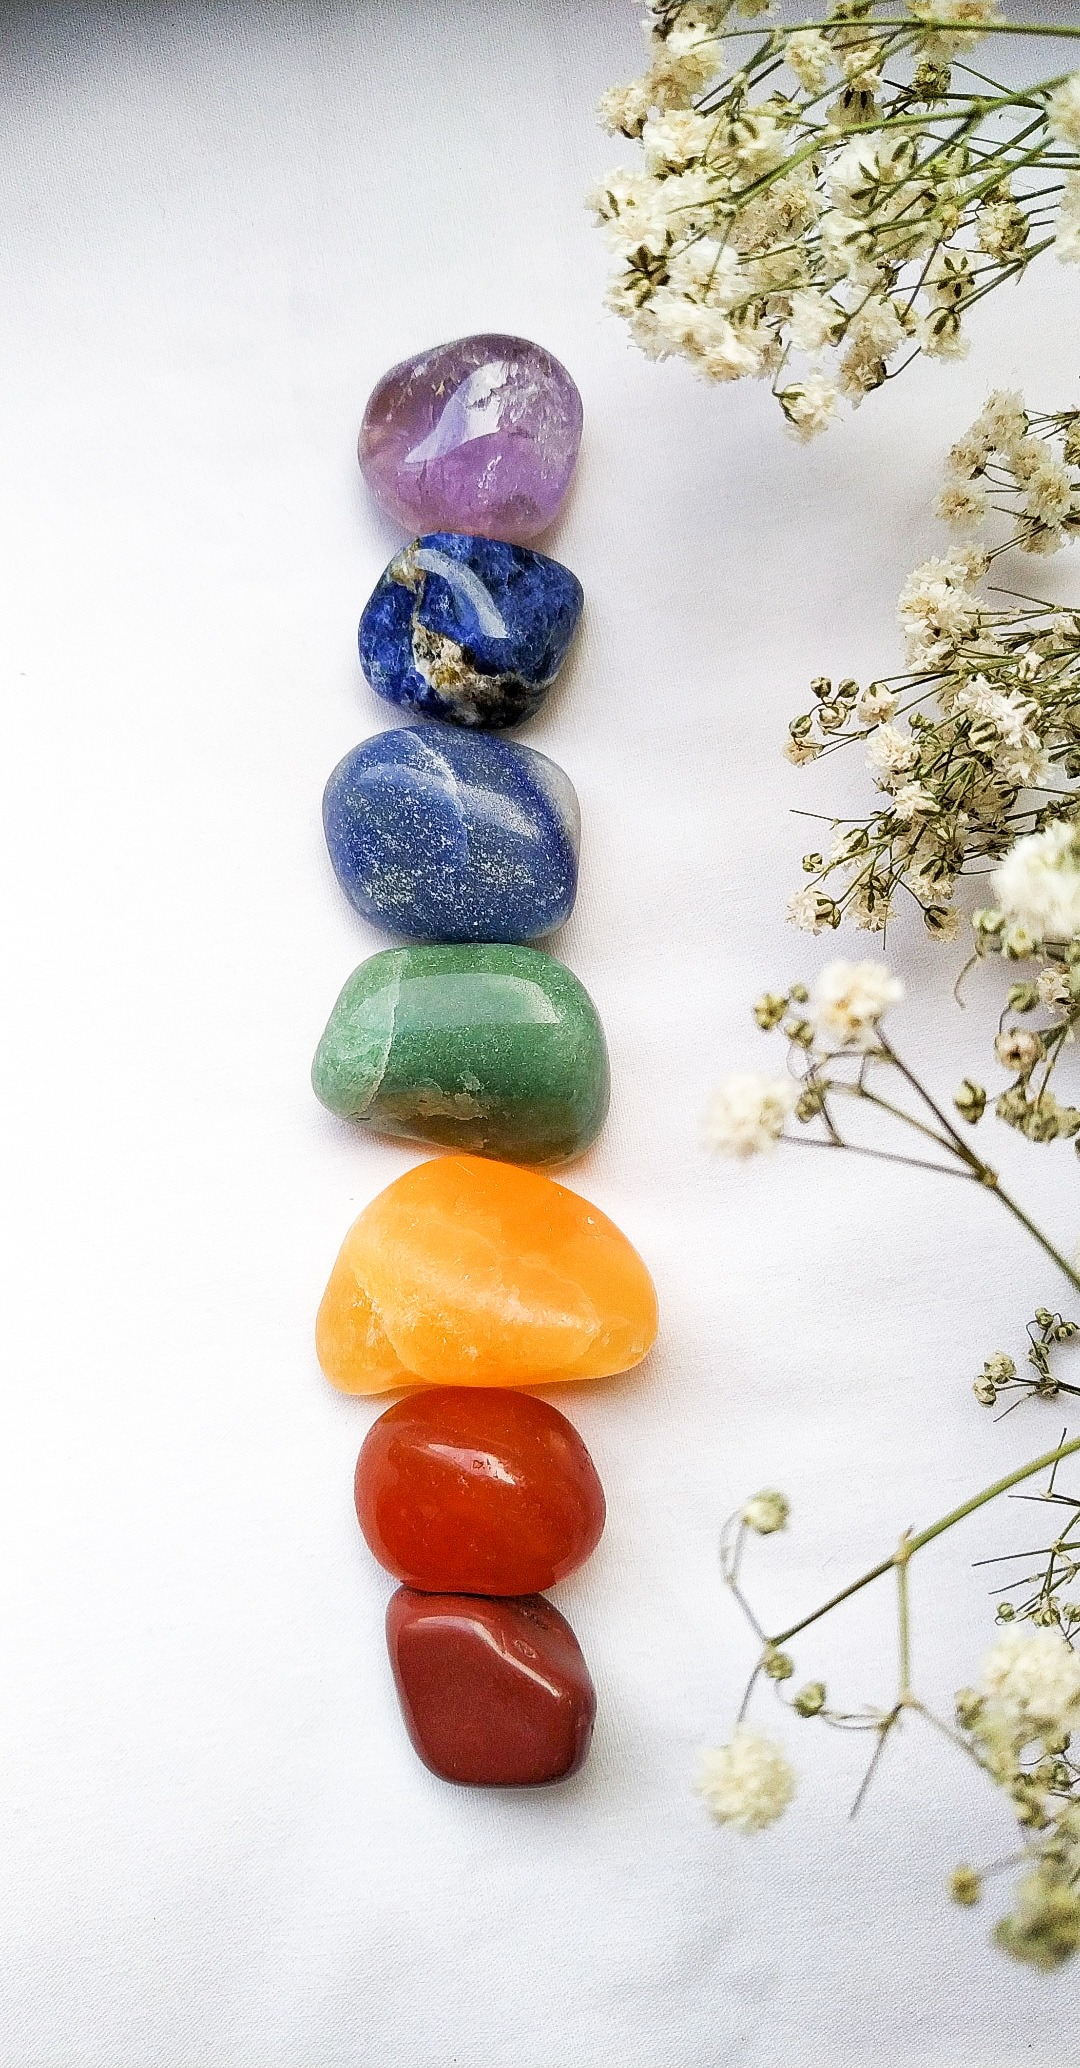 Pedras 7 Chakras Roladas